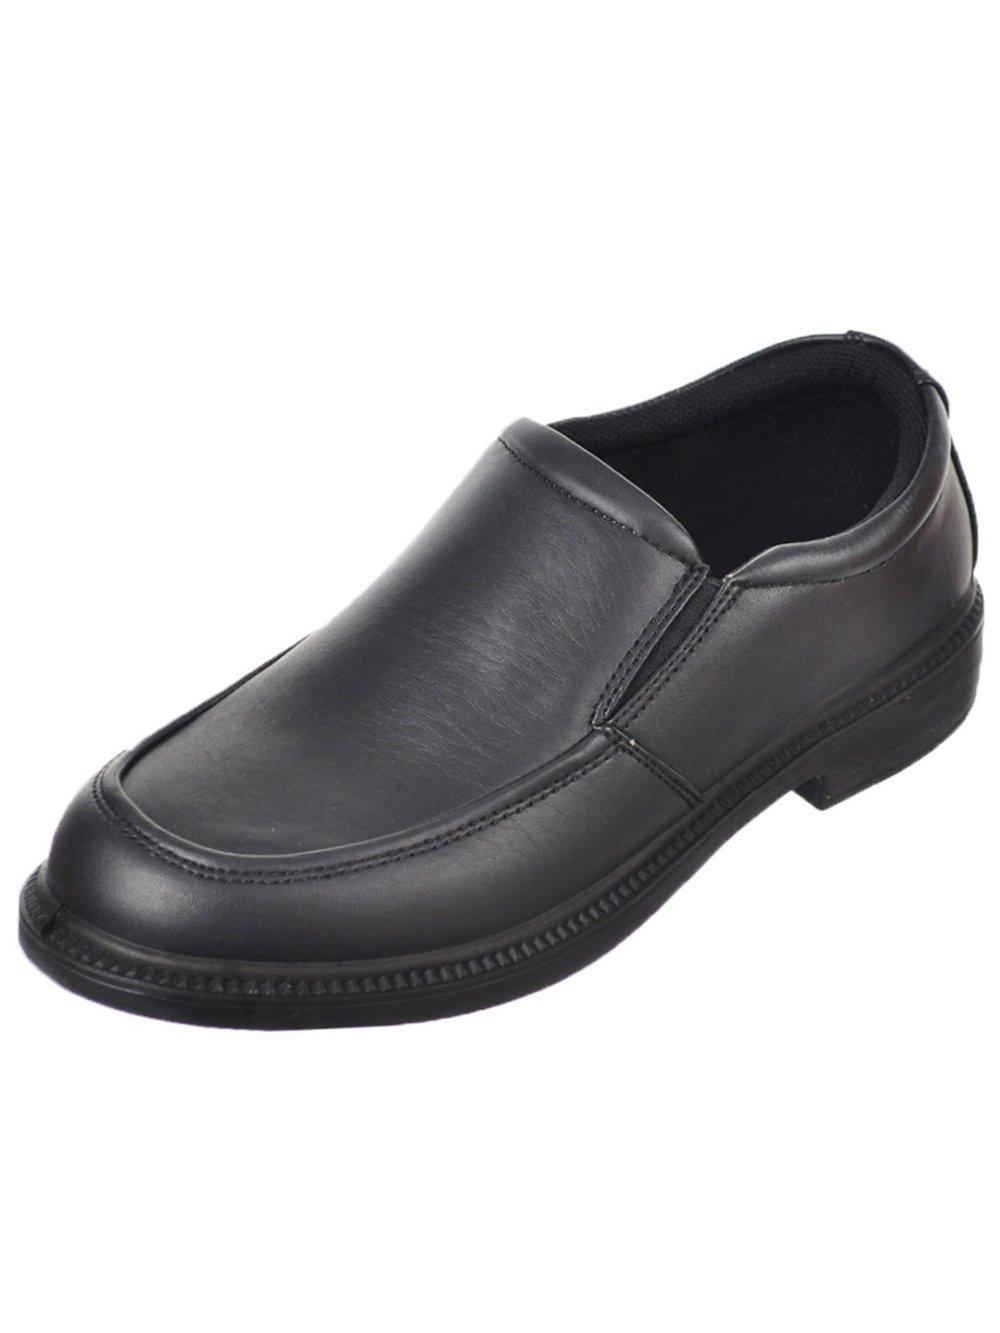 French Toast Boys Evan Slip On Loafer Dress Shoe 13 Black